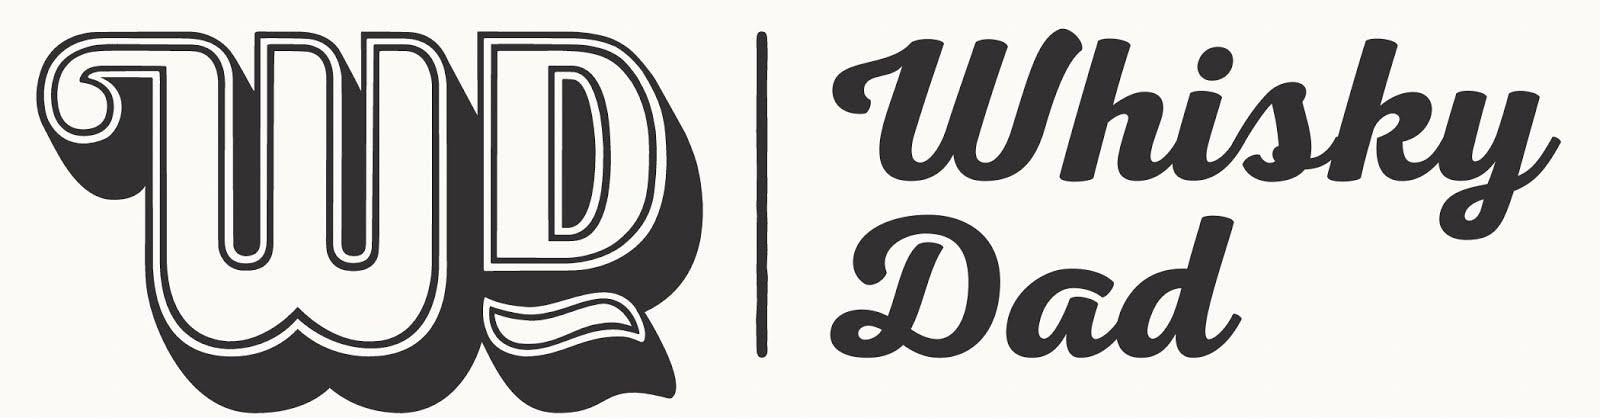 WhiskyDad